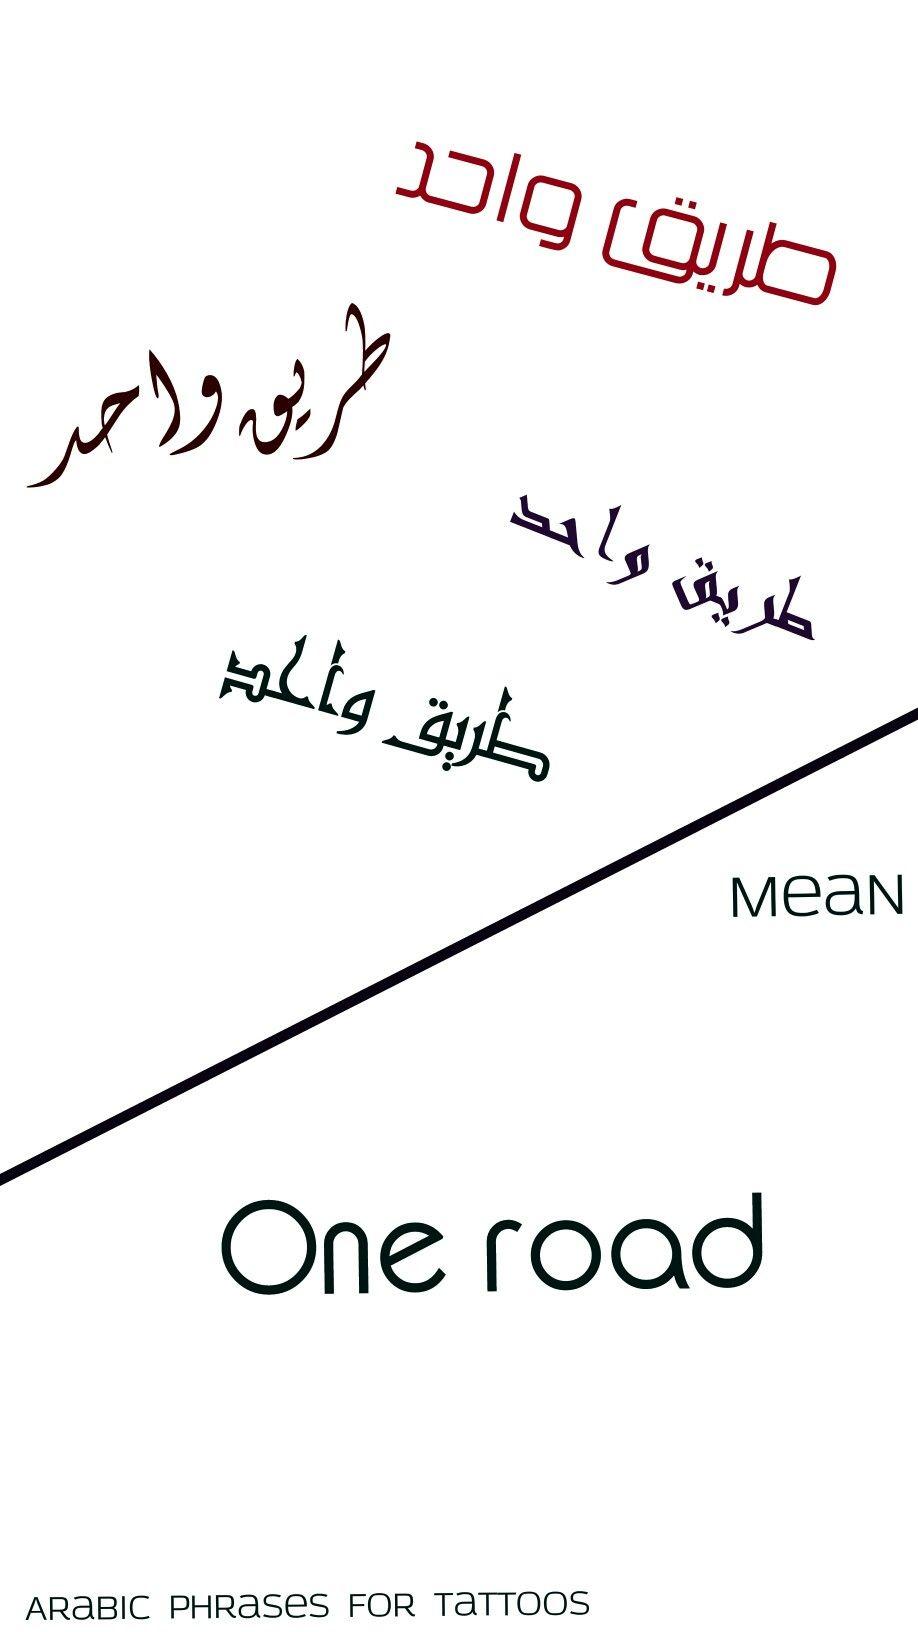 Arabic tattoo meaning one road tattoo arabictattoo tattoo arabic tattoo meaning one road tattoo arabictattoo buycottarizona